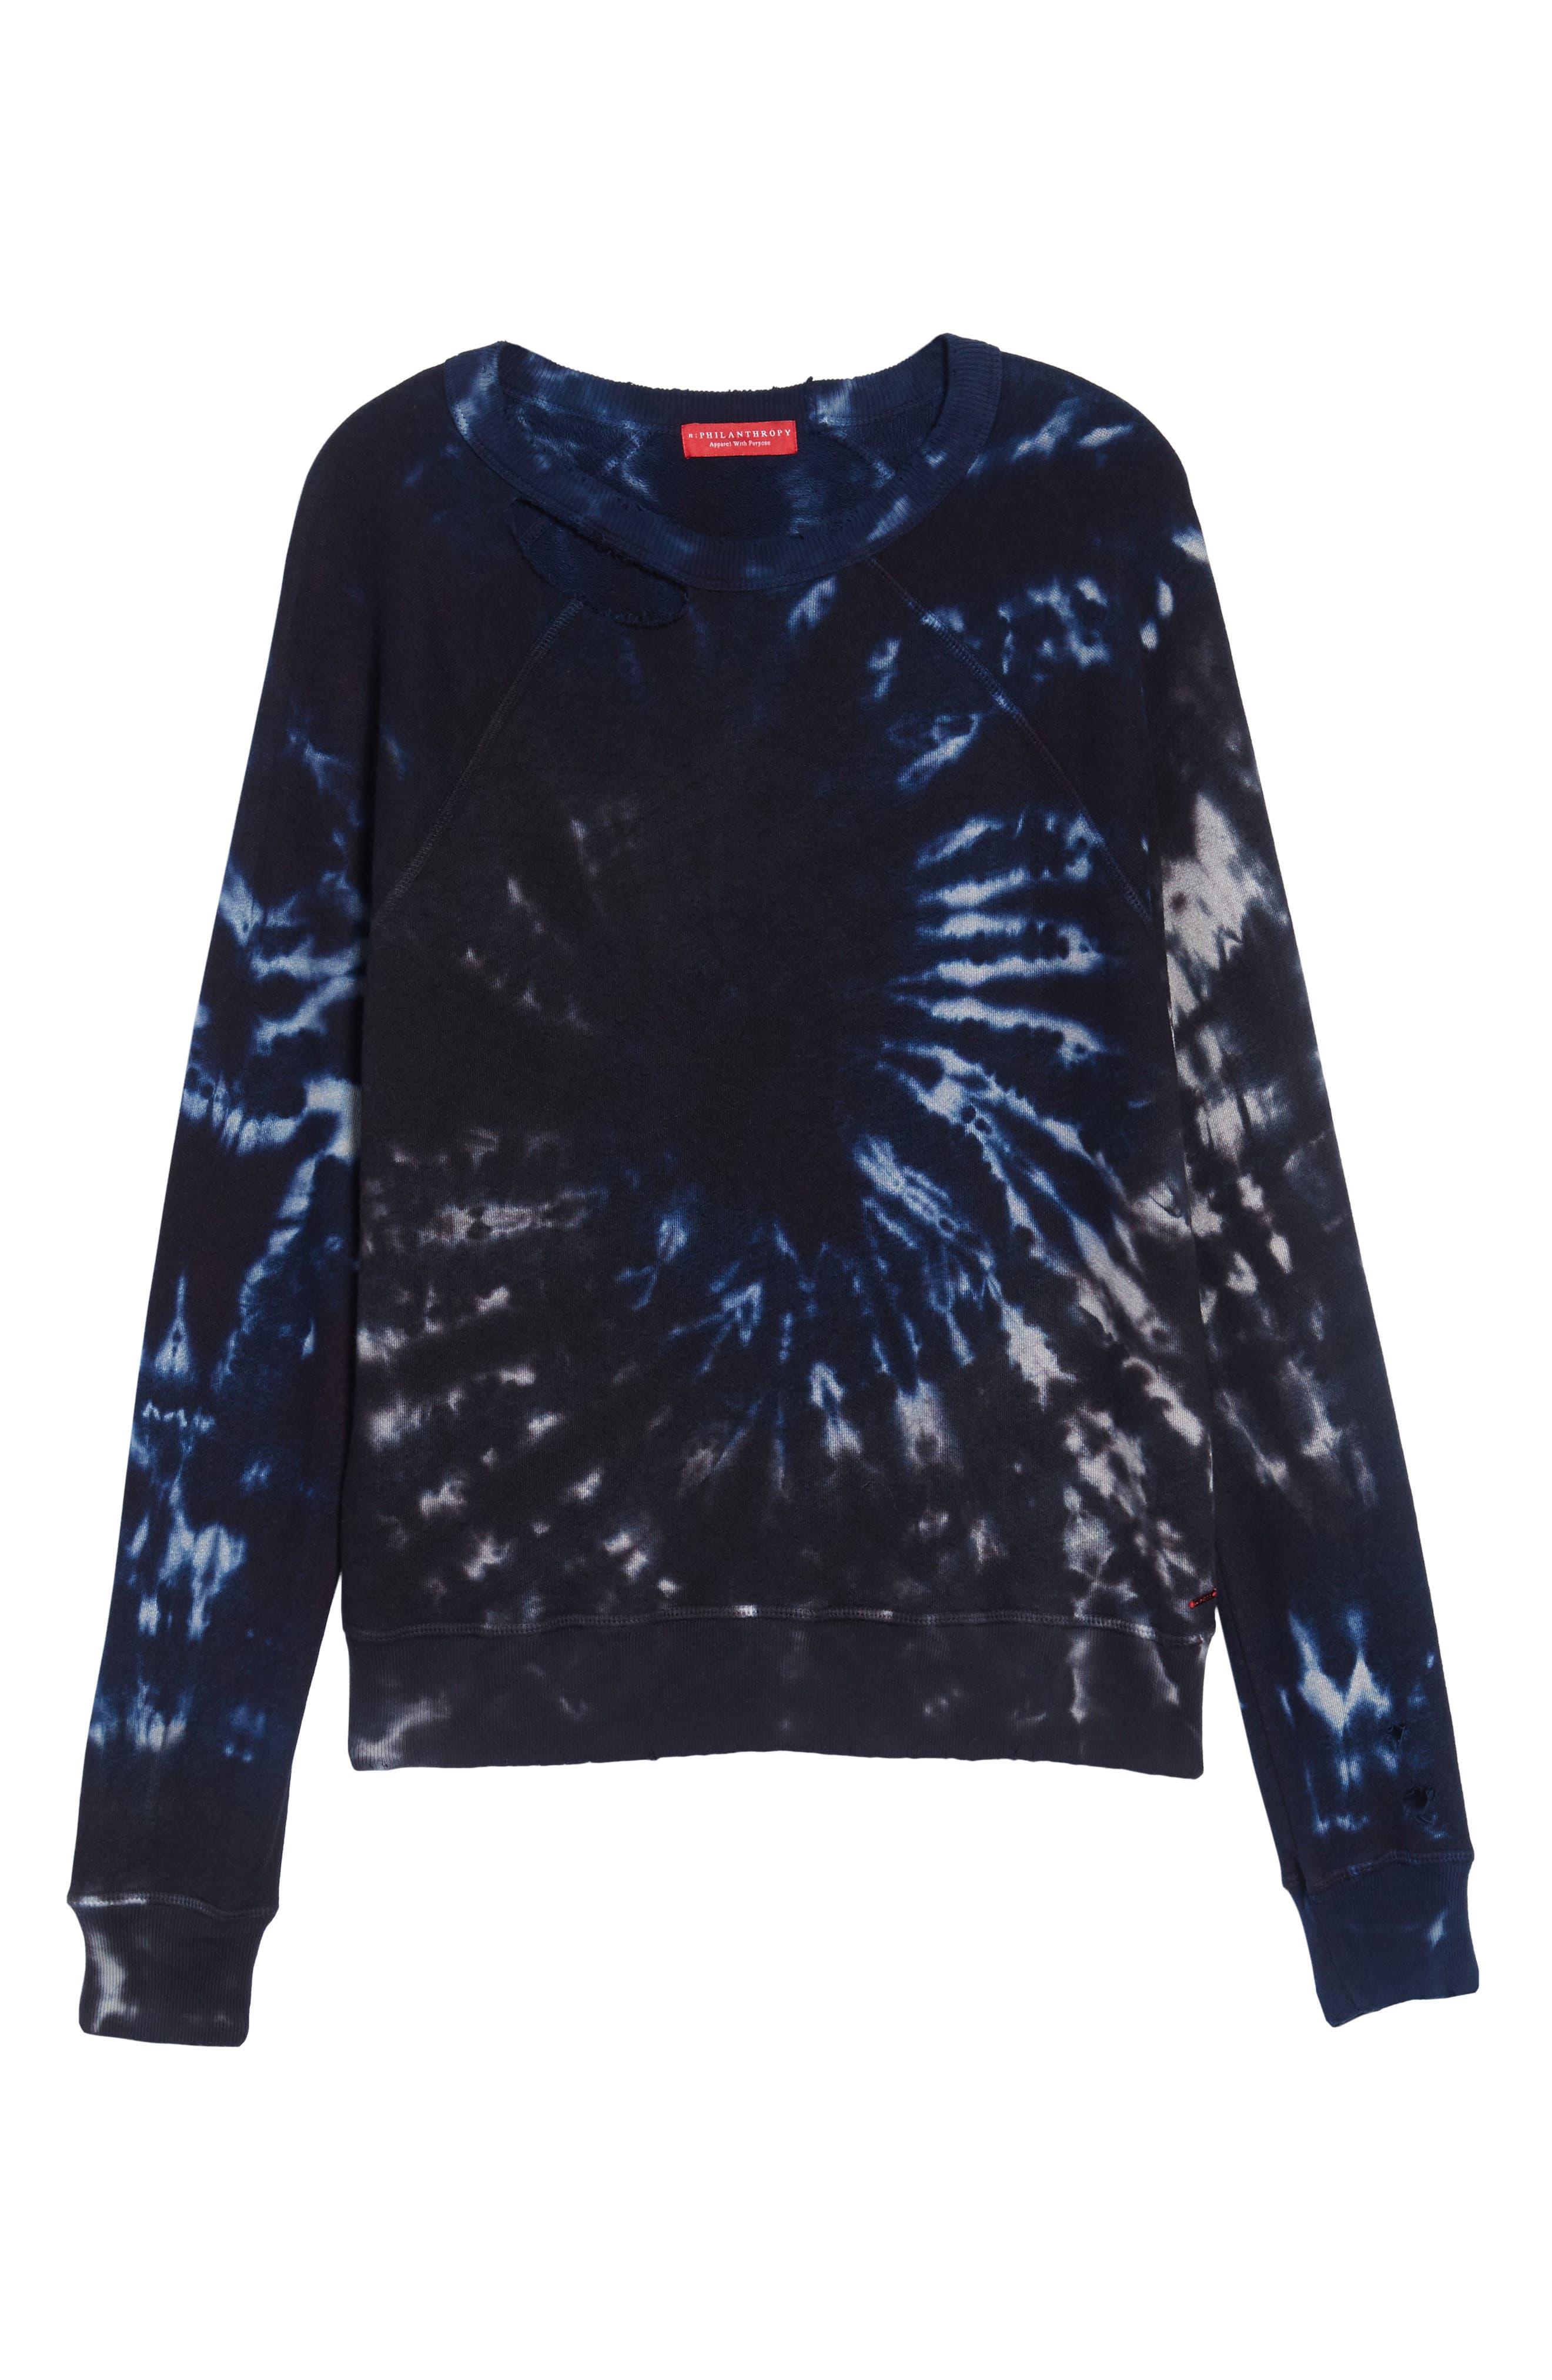 Nic Distressed Sweatshirt,                             Alternate thumbnail 6, color,                             010